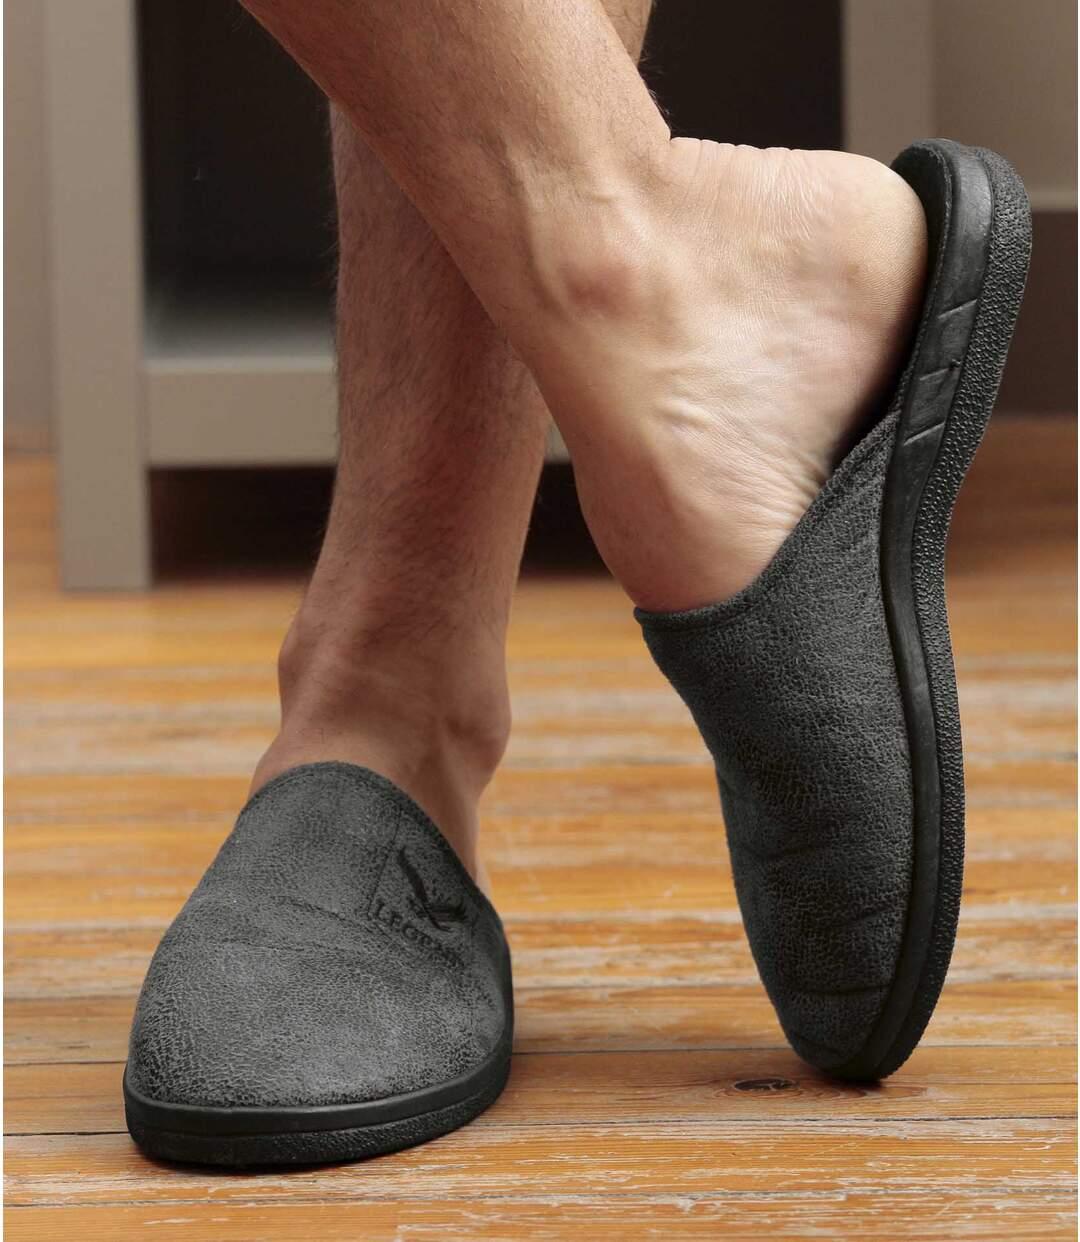 Semišové pantofle podšité fleecem